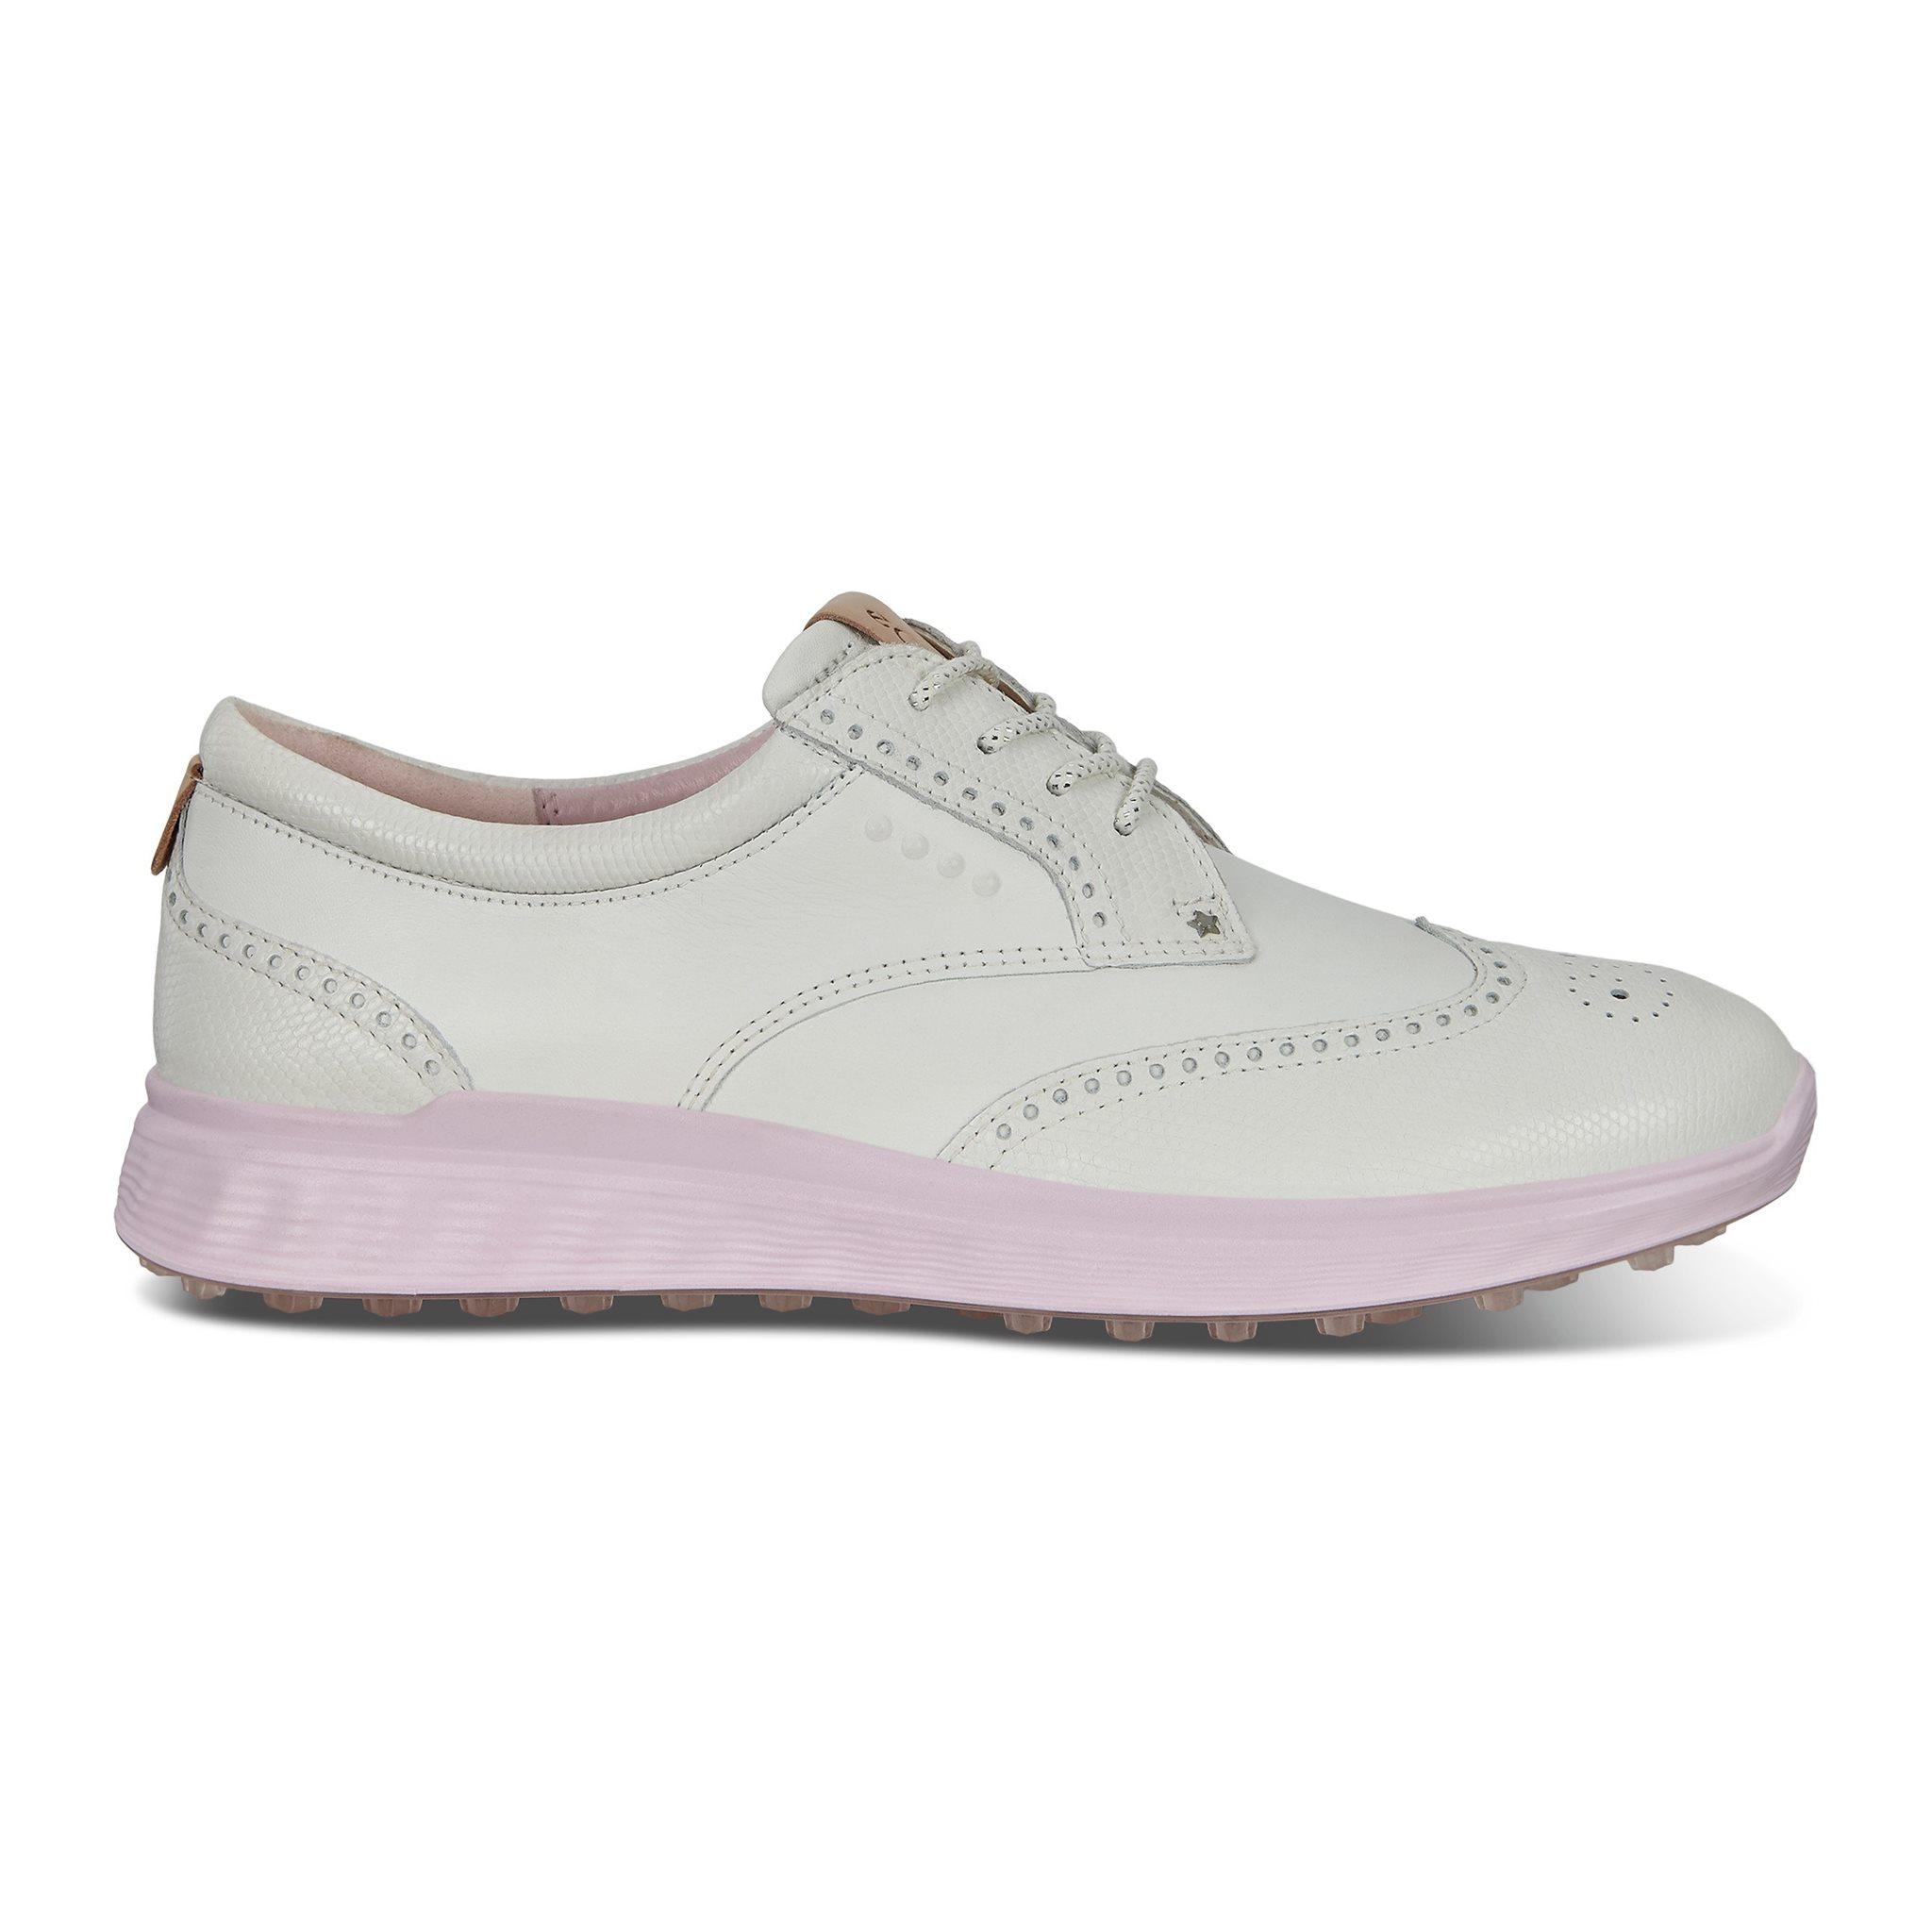 Ecco dames golfschoenen S-Classic wit